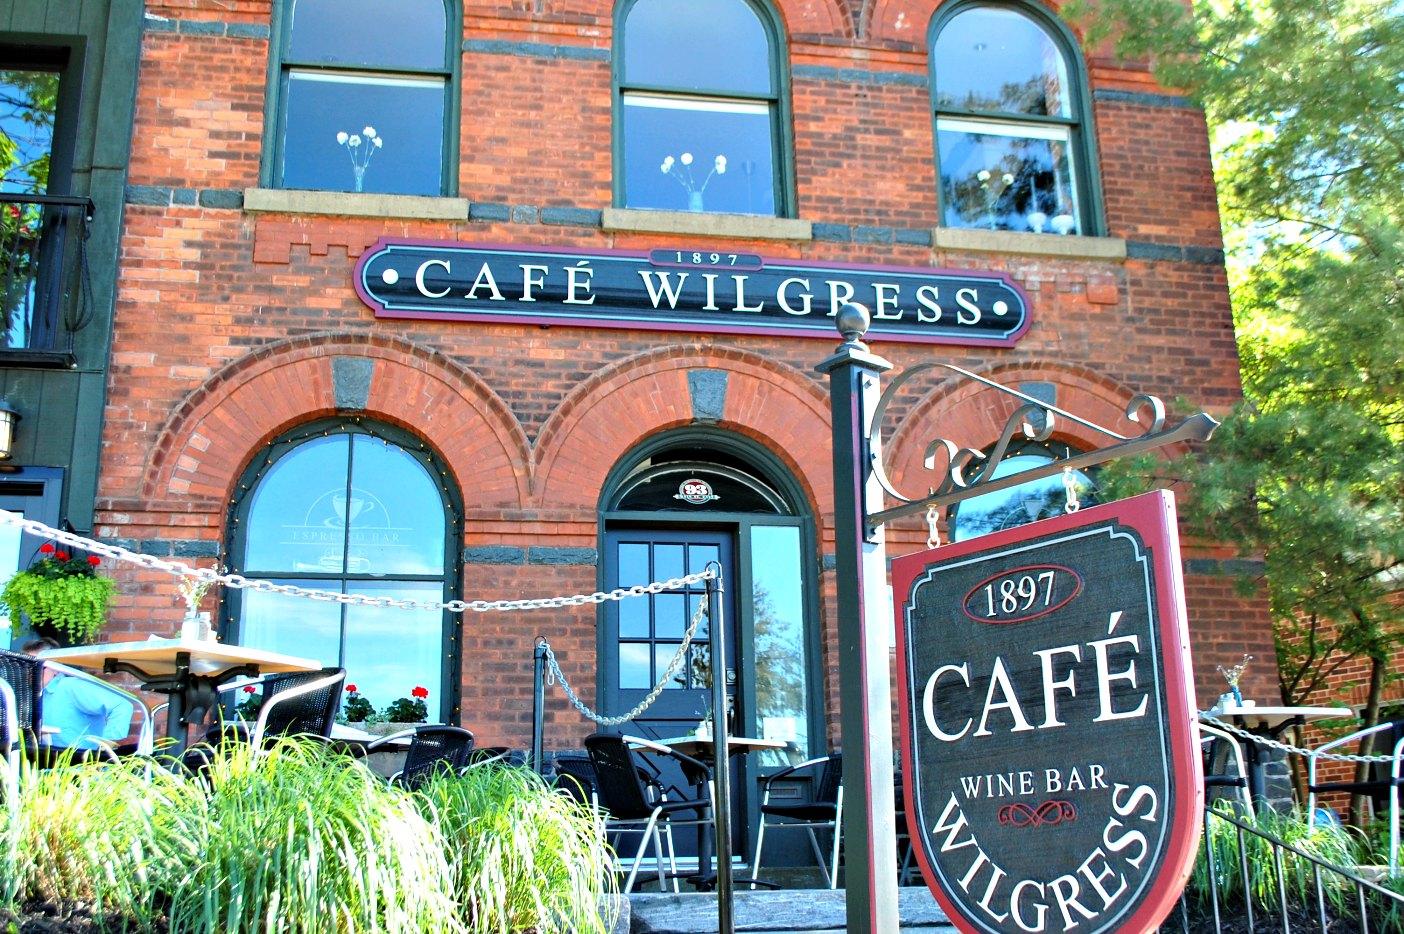 Cafe Wilgress